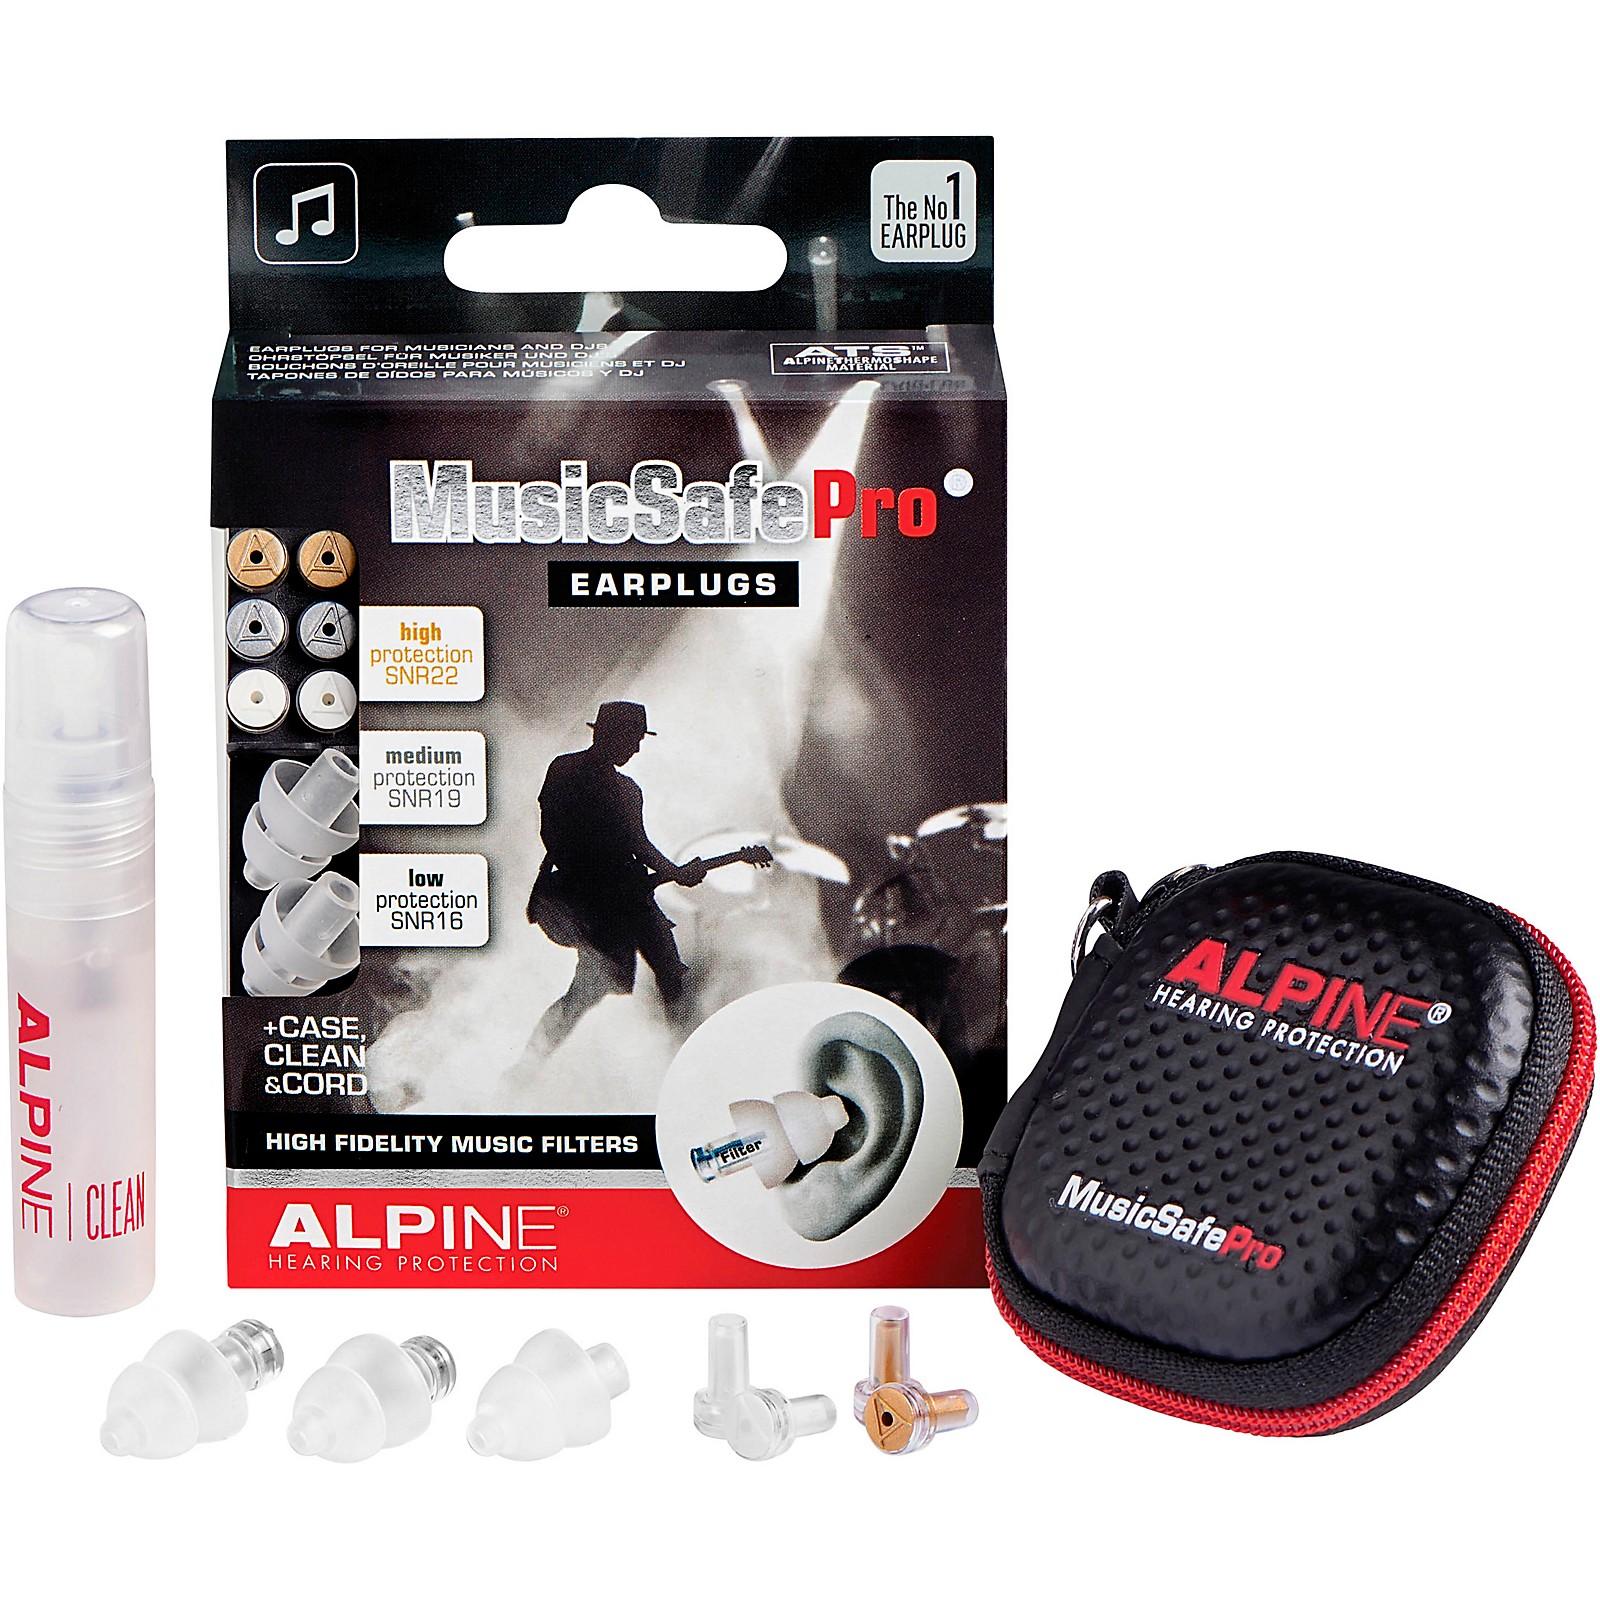 Alpine Hearing Protection MusicSafe Pro Earplugs (Transparent)